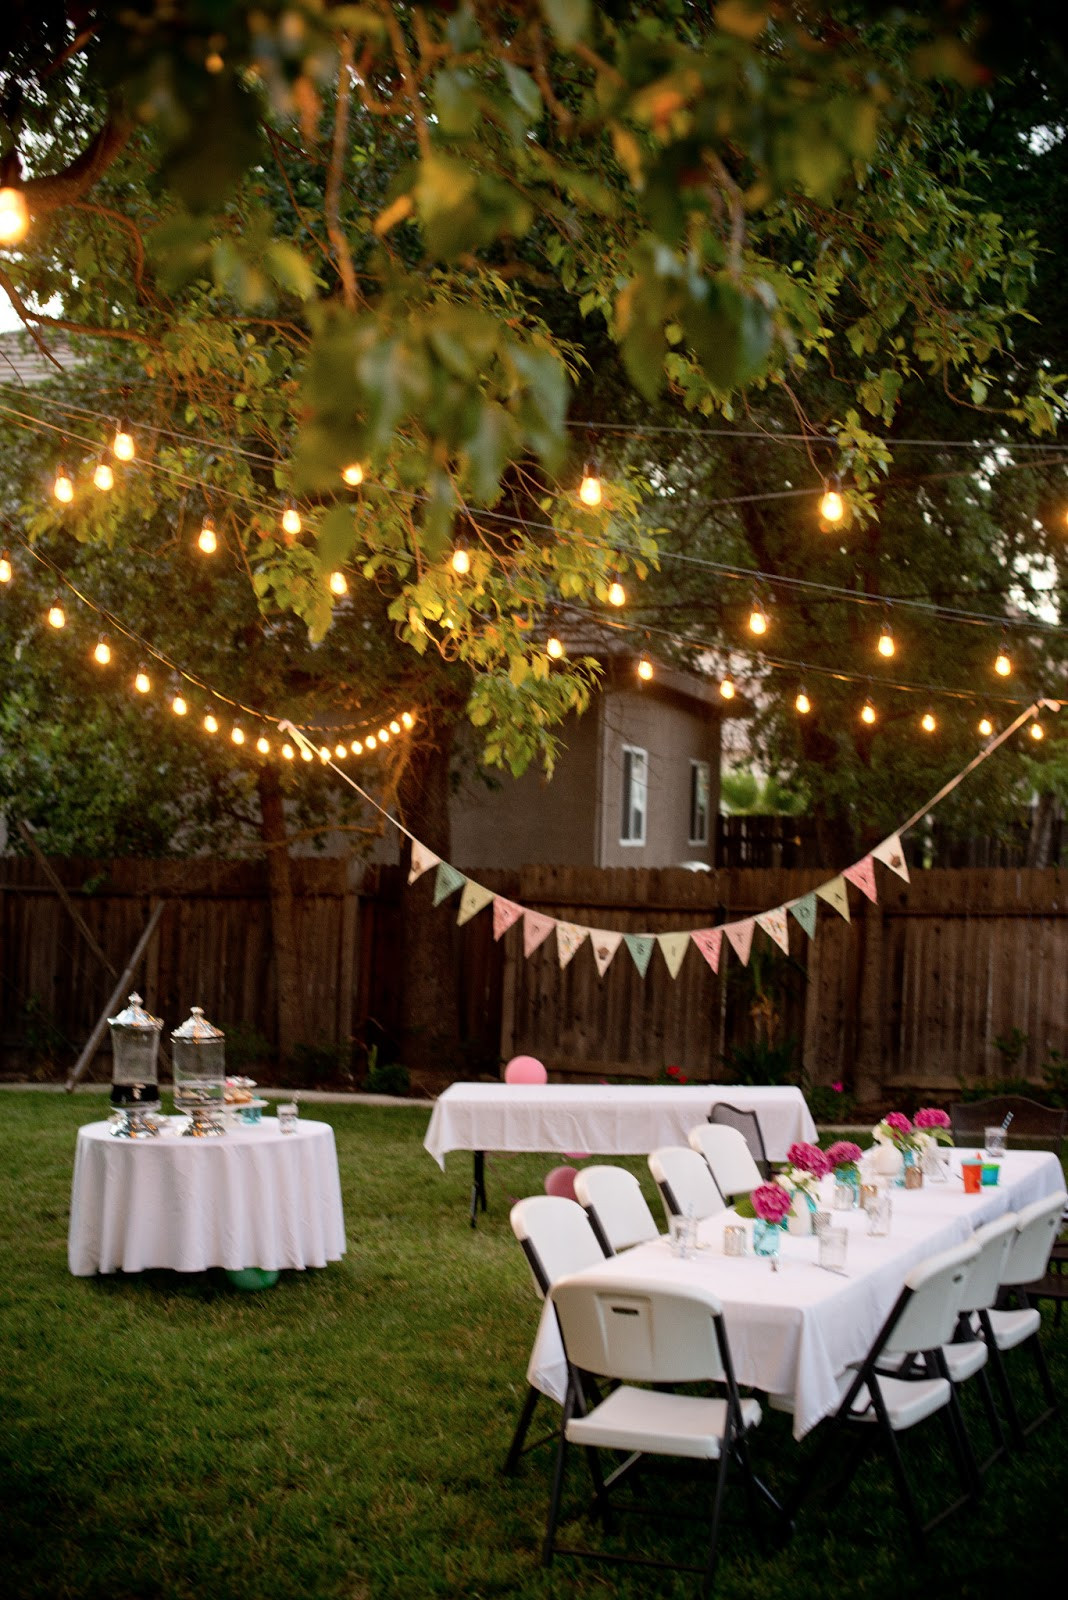 Lighting Ideas For Backyard Party  Domestic Fashionista Backyard Birthday Fun Pink